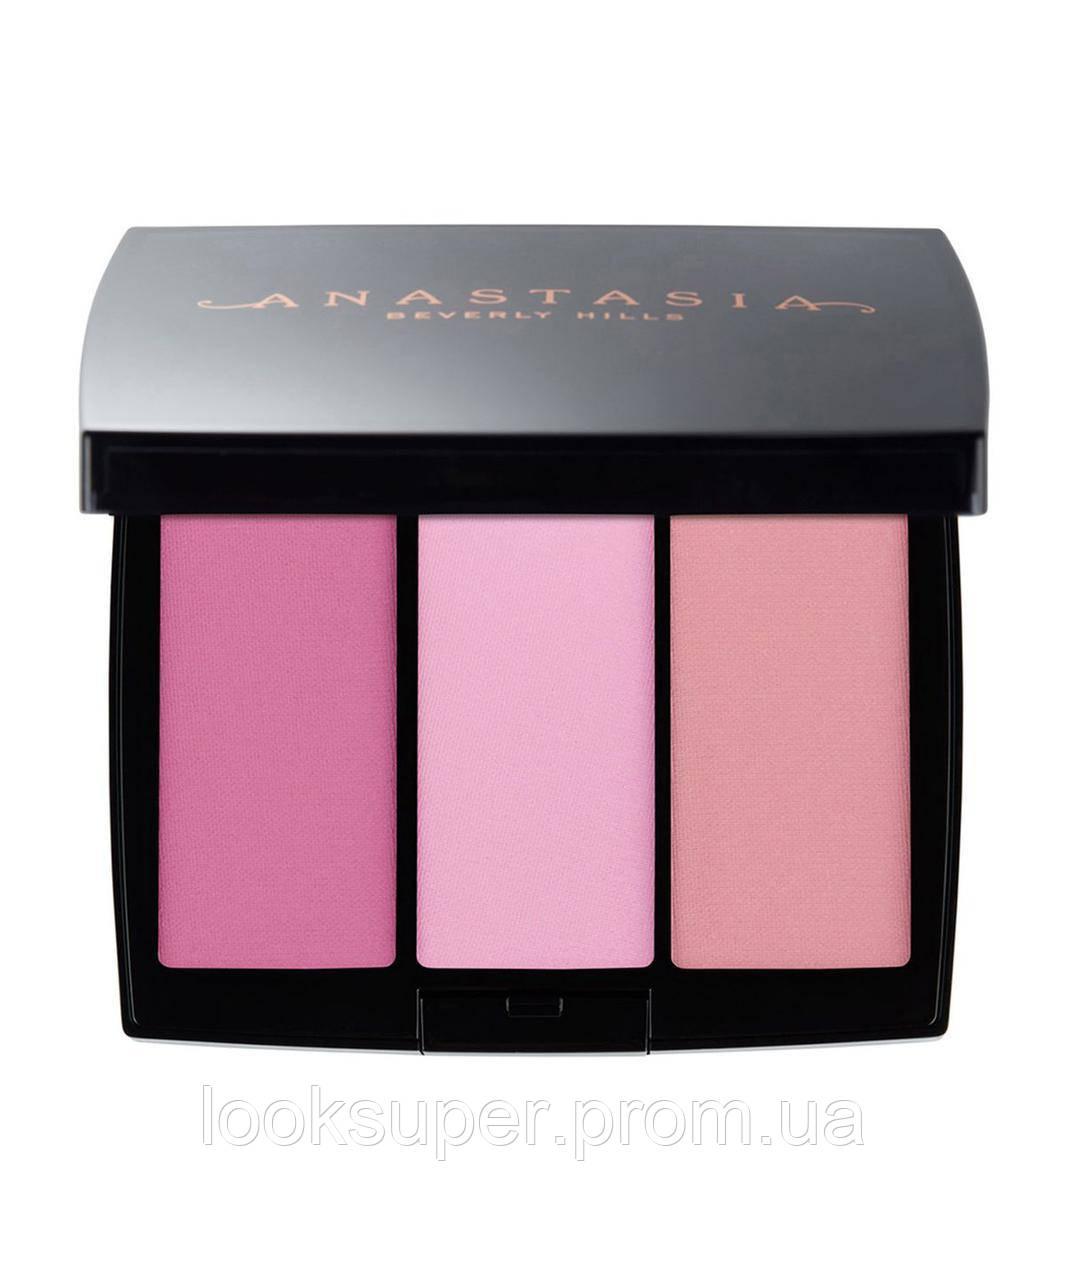 Набор румян Anastasia Beverly Hills (Pink Passion)